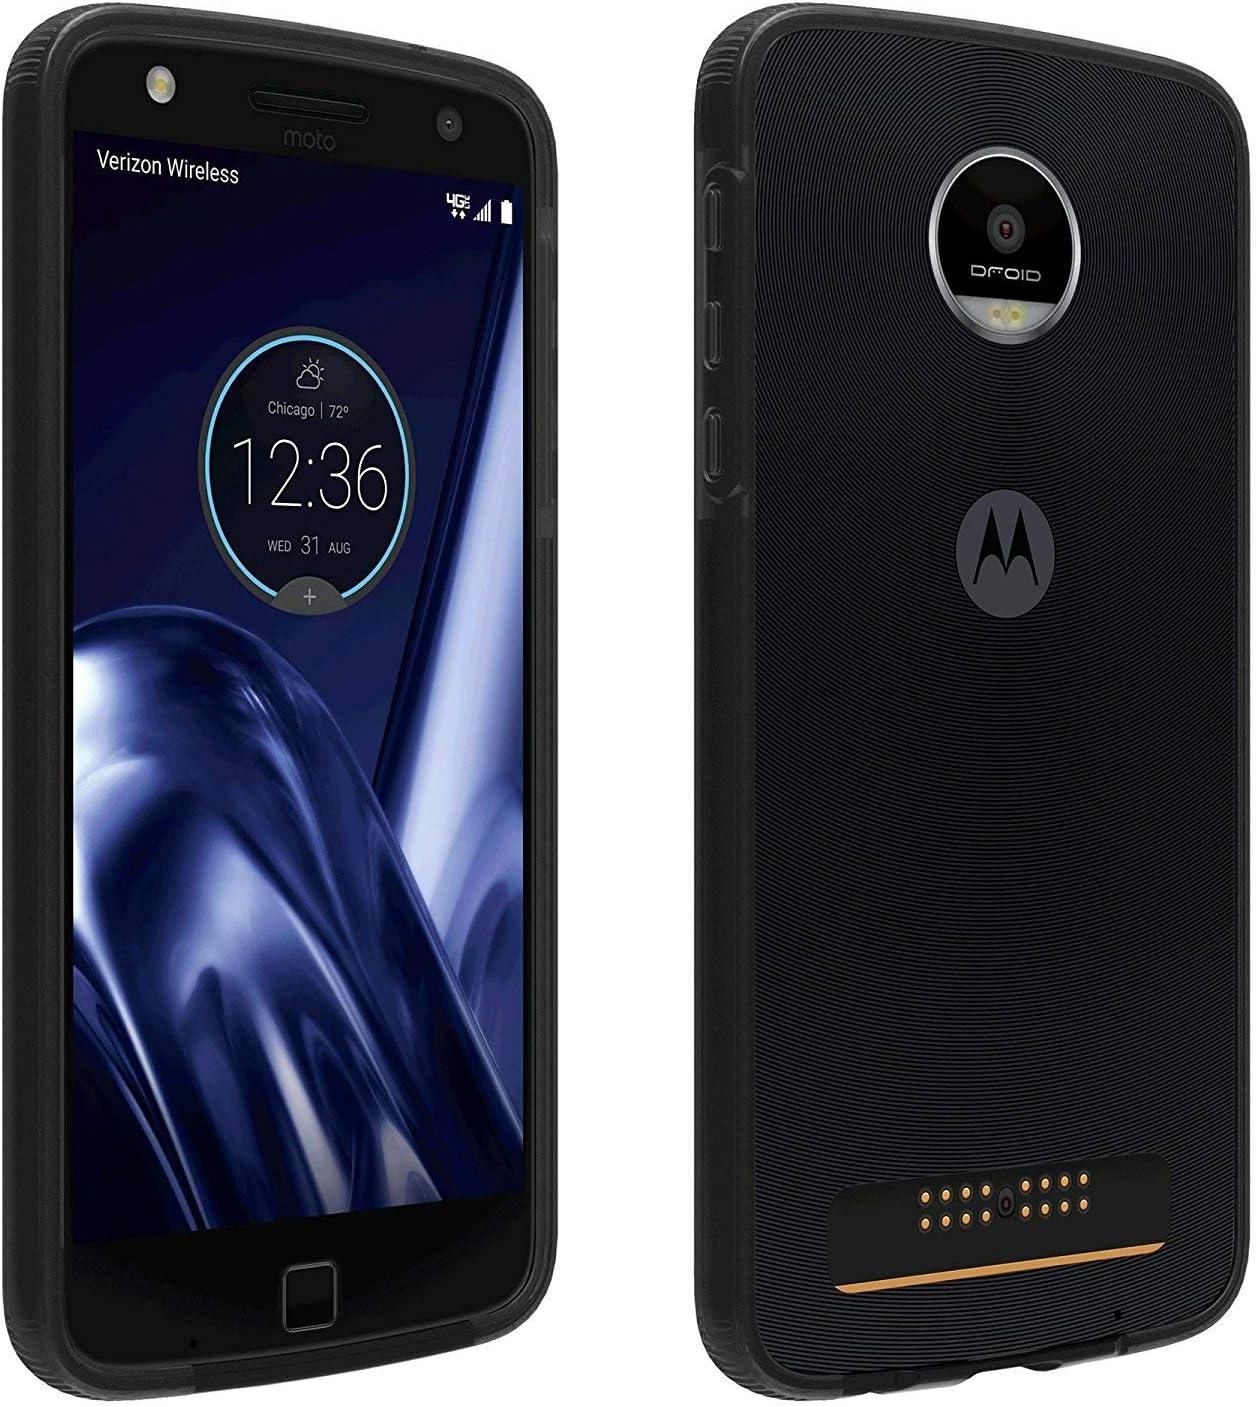 Verizon OEM - Carcasa de Dos Tonos para Motorola Moto Z Play Droid ...